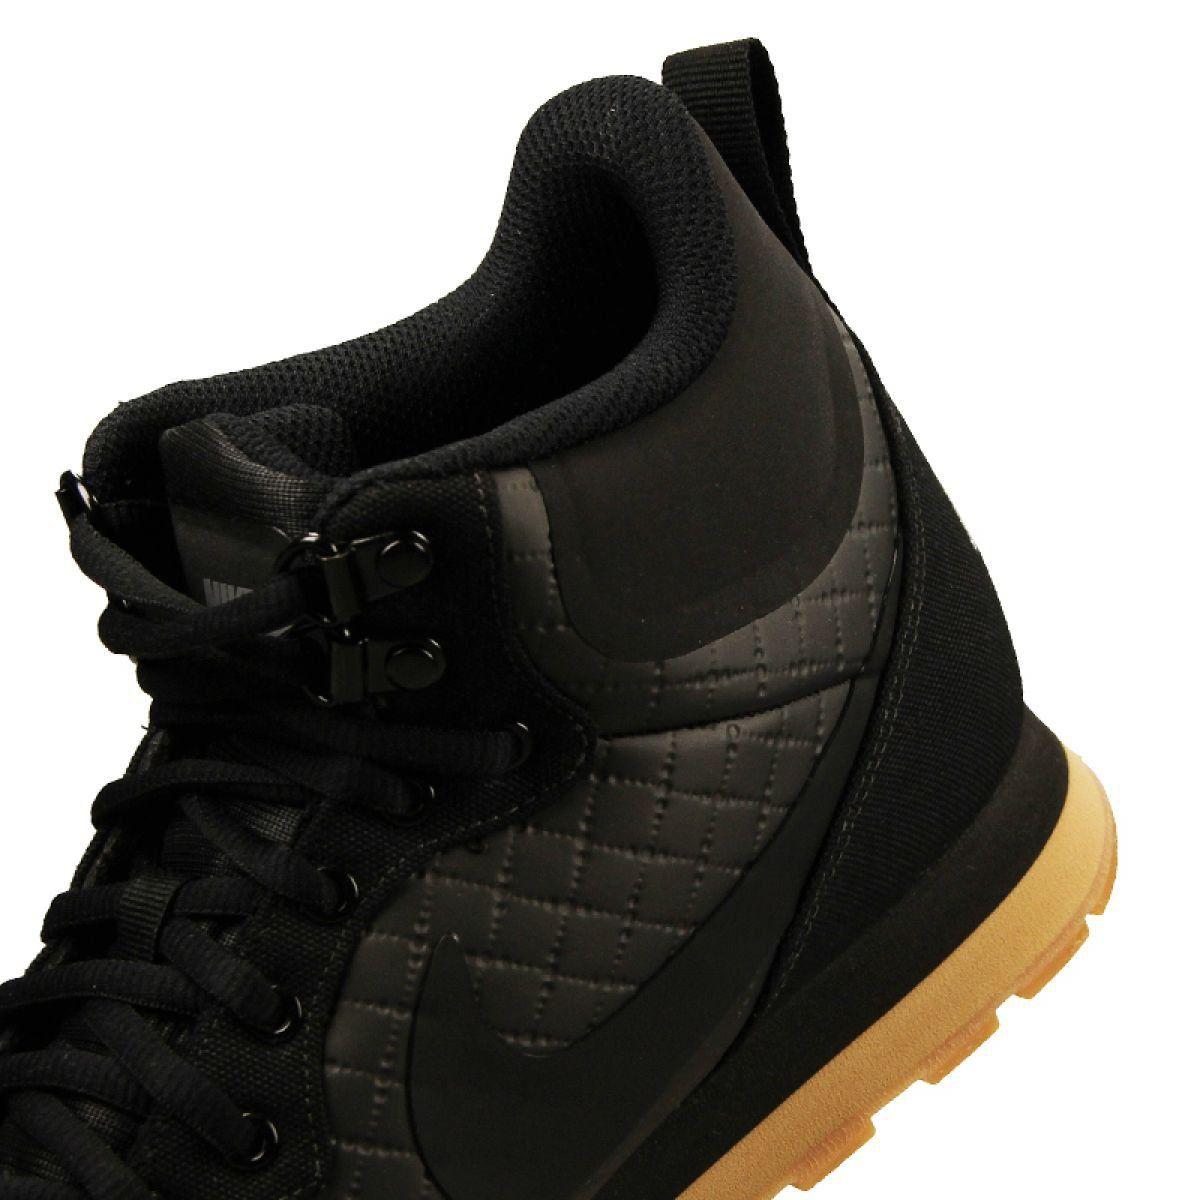 Sportowe Meskie Nike Buty Nike Md Runner Mid Prem M 844864 006 Czarne Black Shoes Black Nikes Mens Nike Shoes